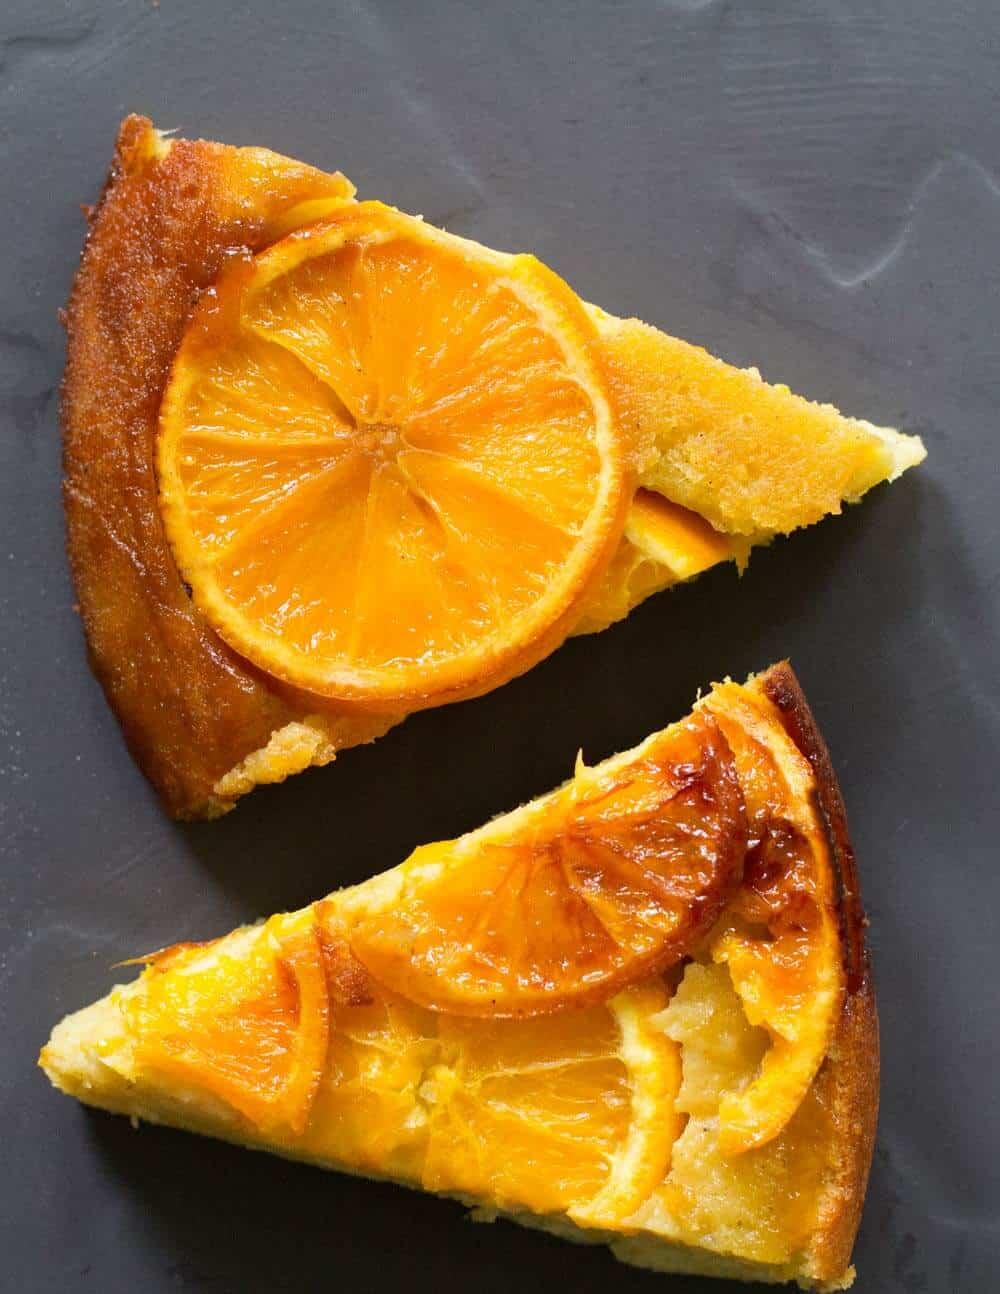 Slices of Cast Iron Orange Olive Oil Upside Down Cake